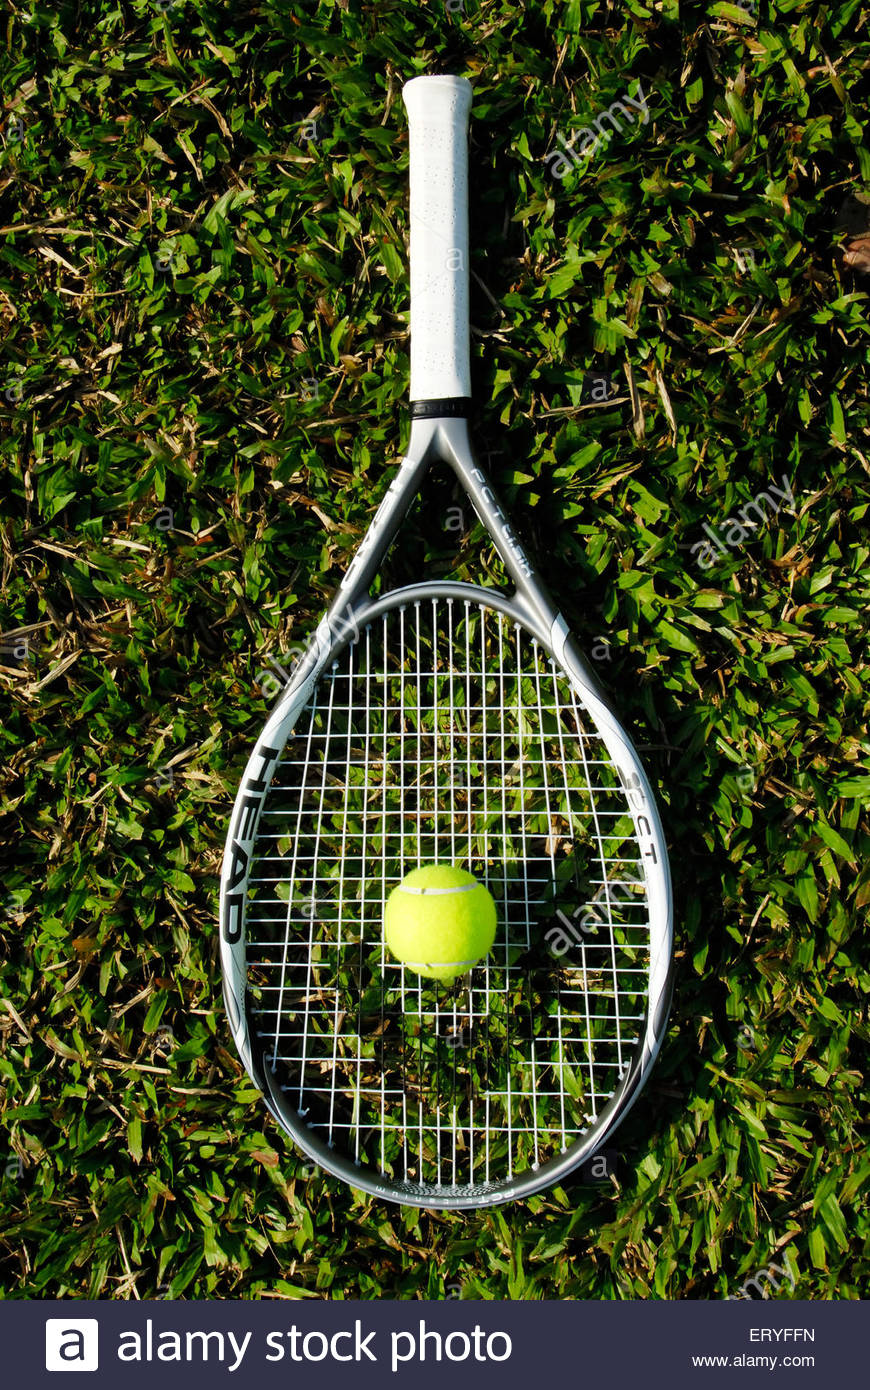 Tennisschläger mit Ball liegend auf dem üppigen grünen Rasen 2009 Stockbild